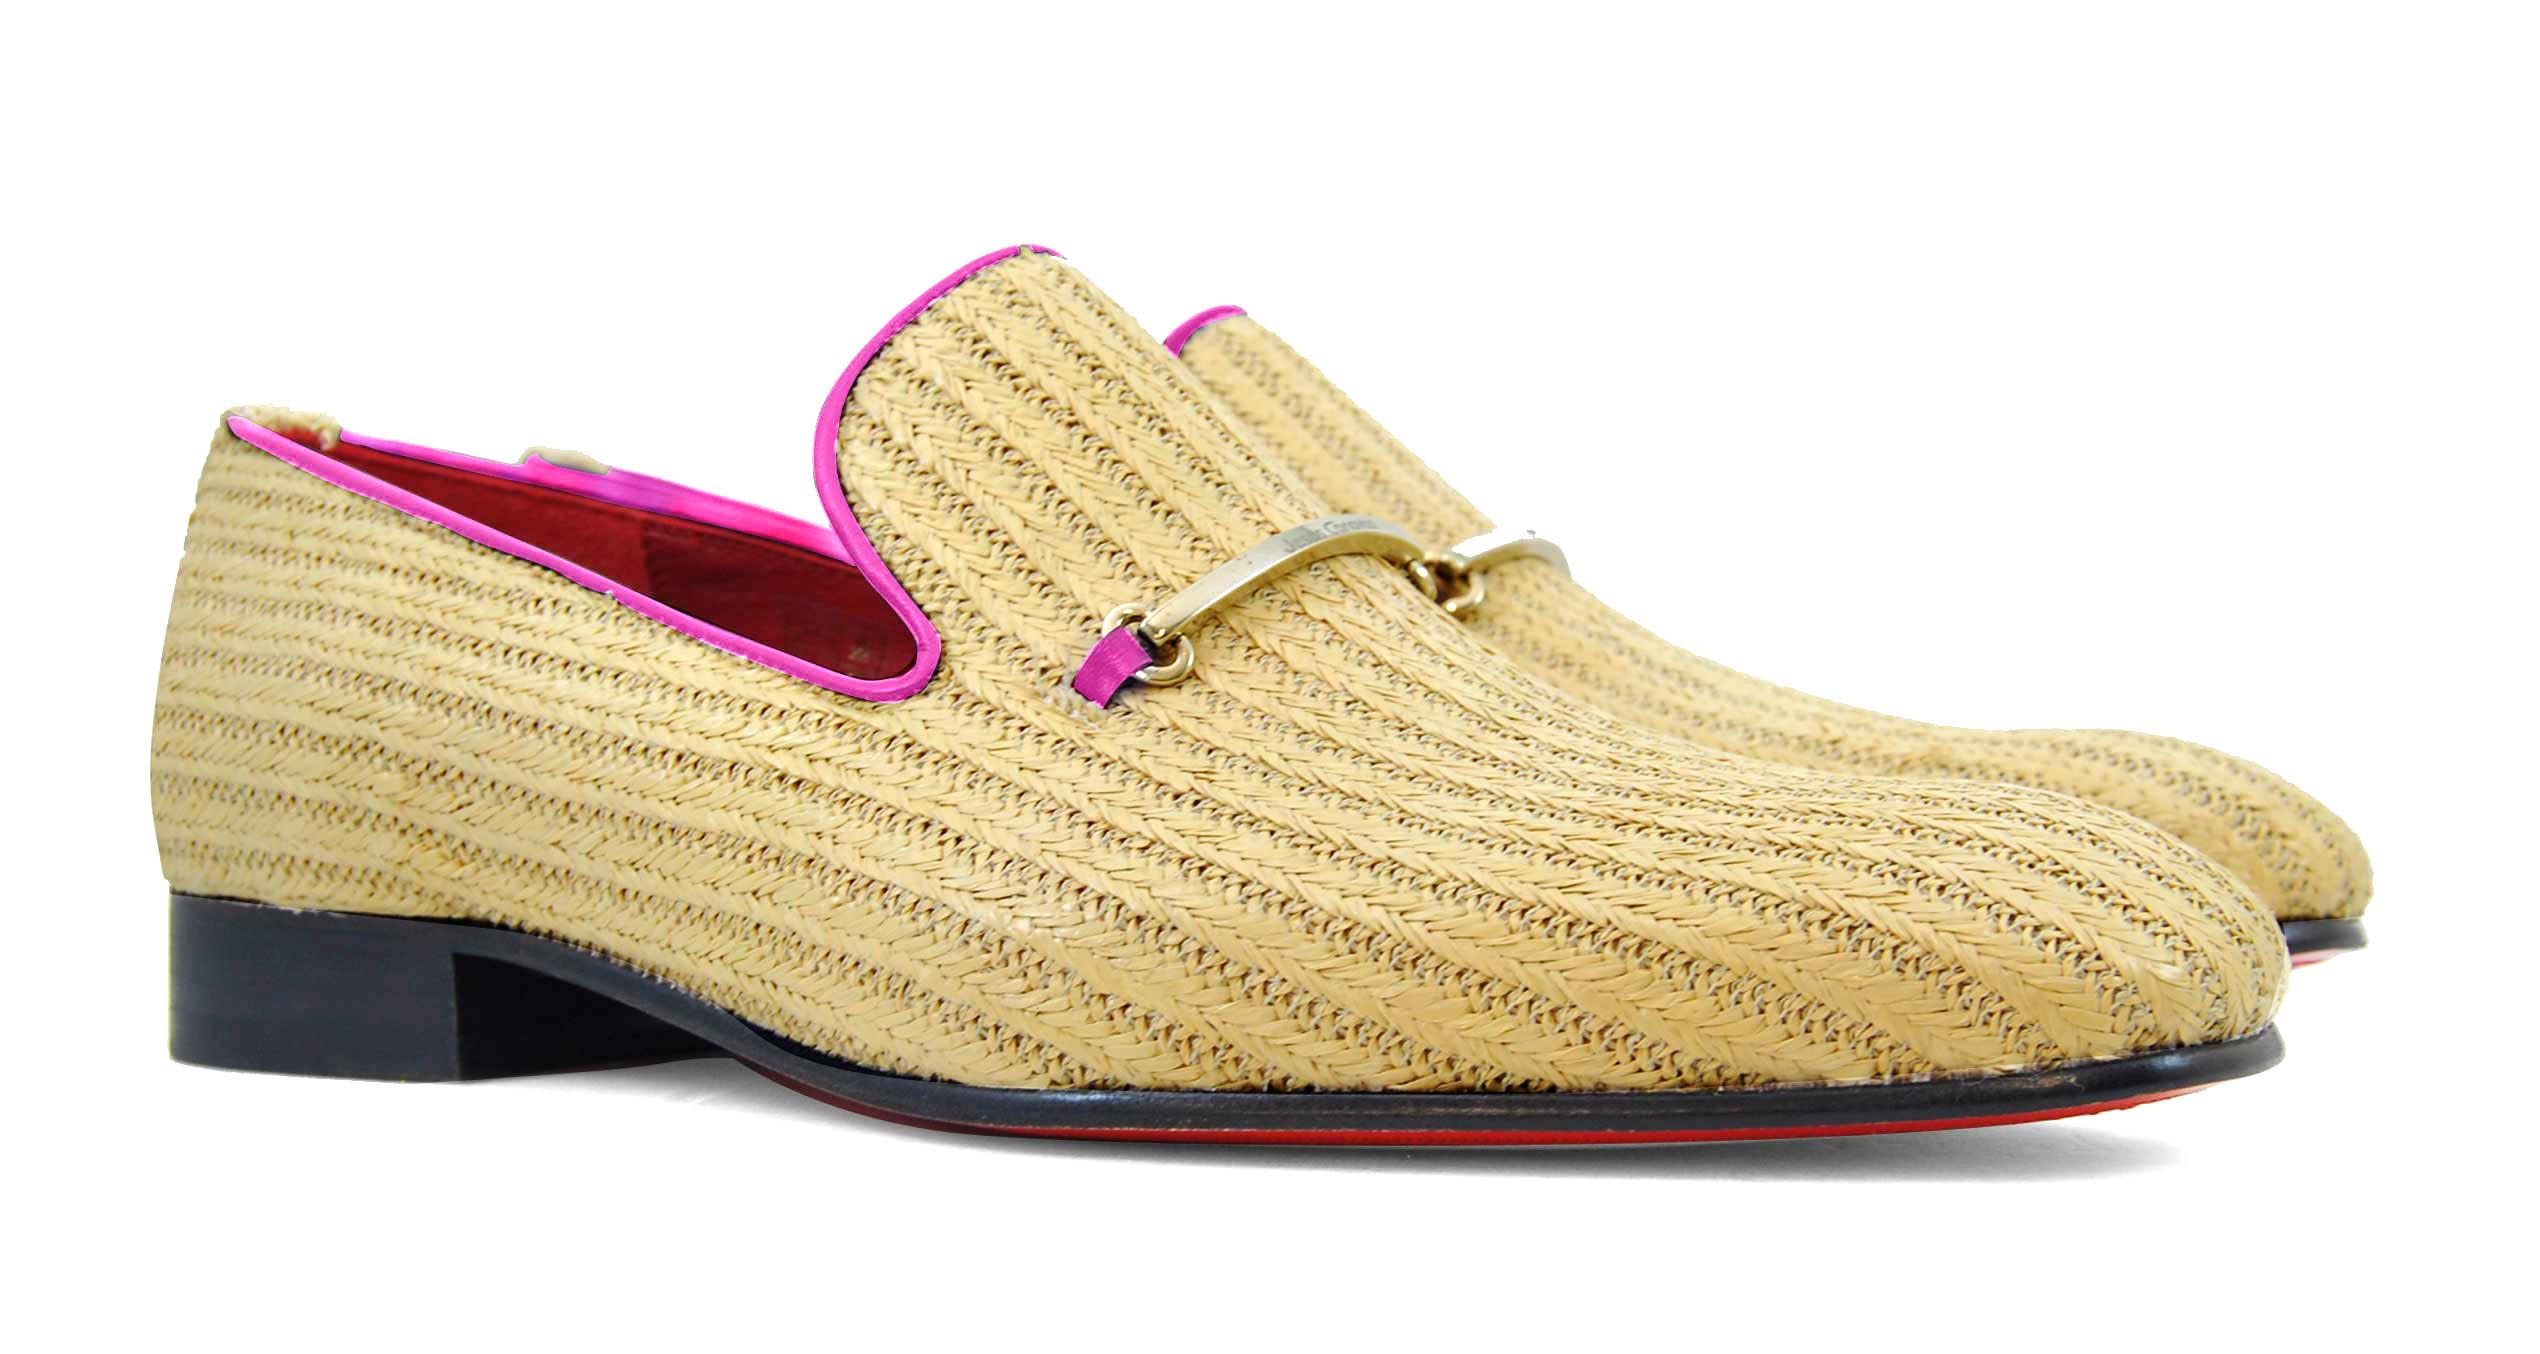 Foto 5 de Zapatos Palma Panameña Con Ribete Rosa